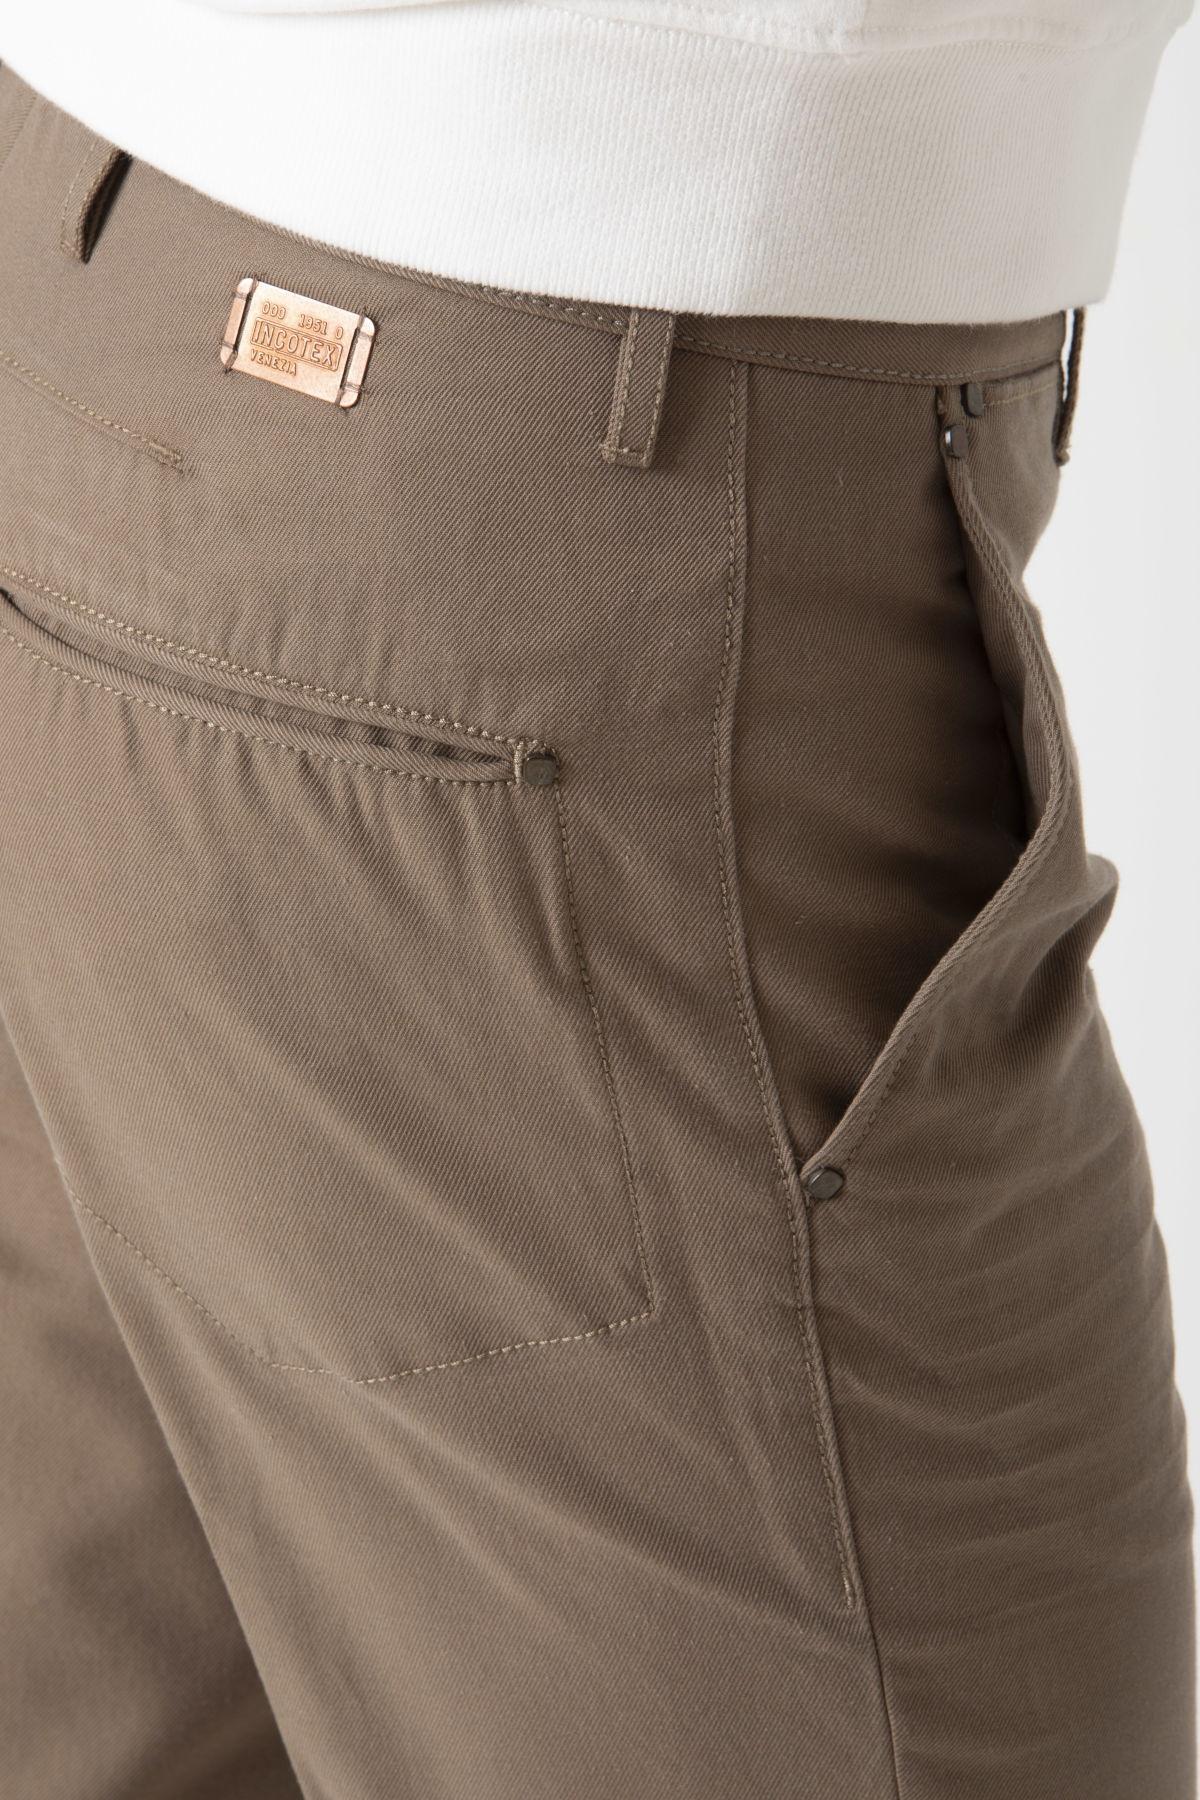 VENEZIA Trousers for man INCOTEX F/W 19-20